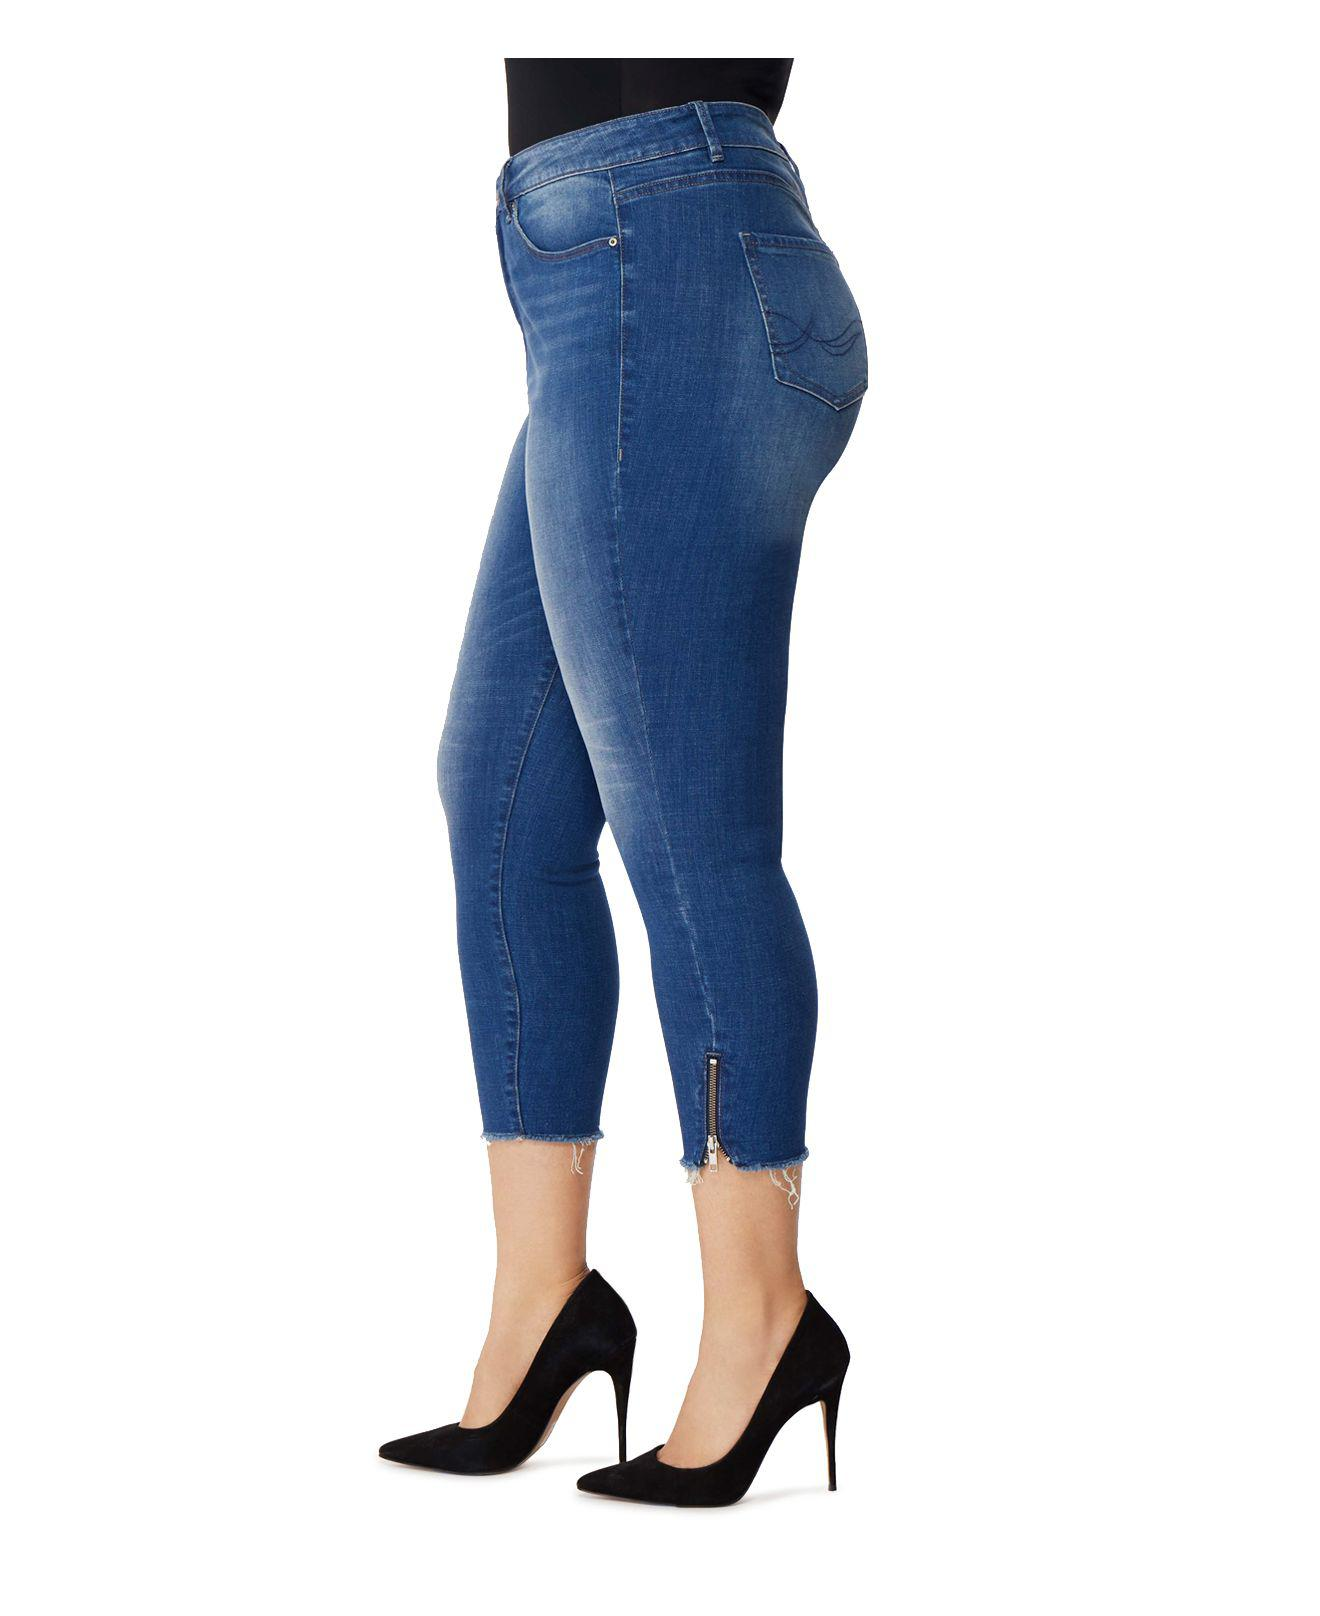 REBEL WILSON X ANGELS Denim Icon Zip-cuff Cropped Jeans In Laurel in Blue